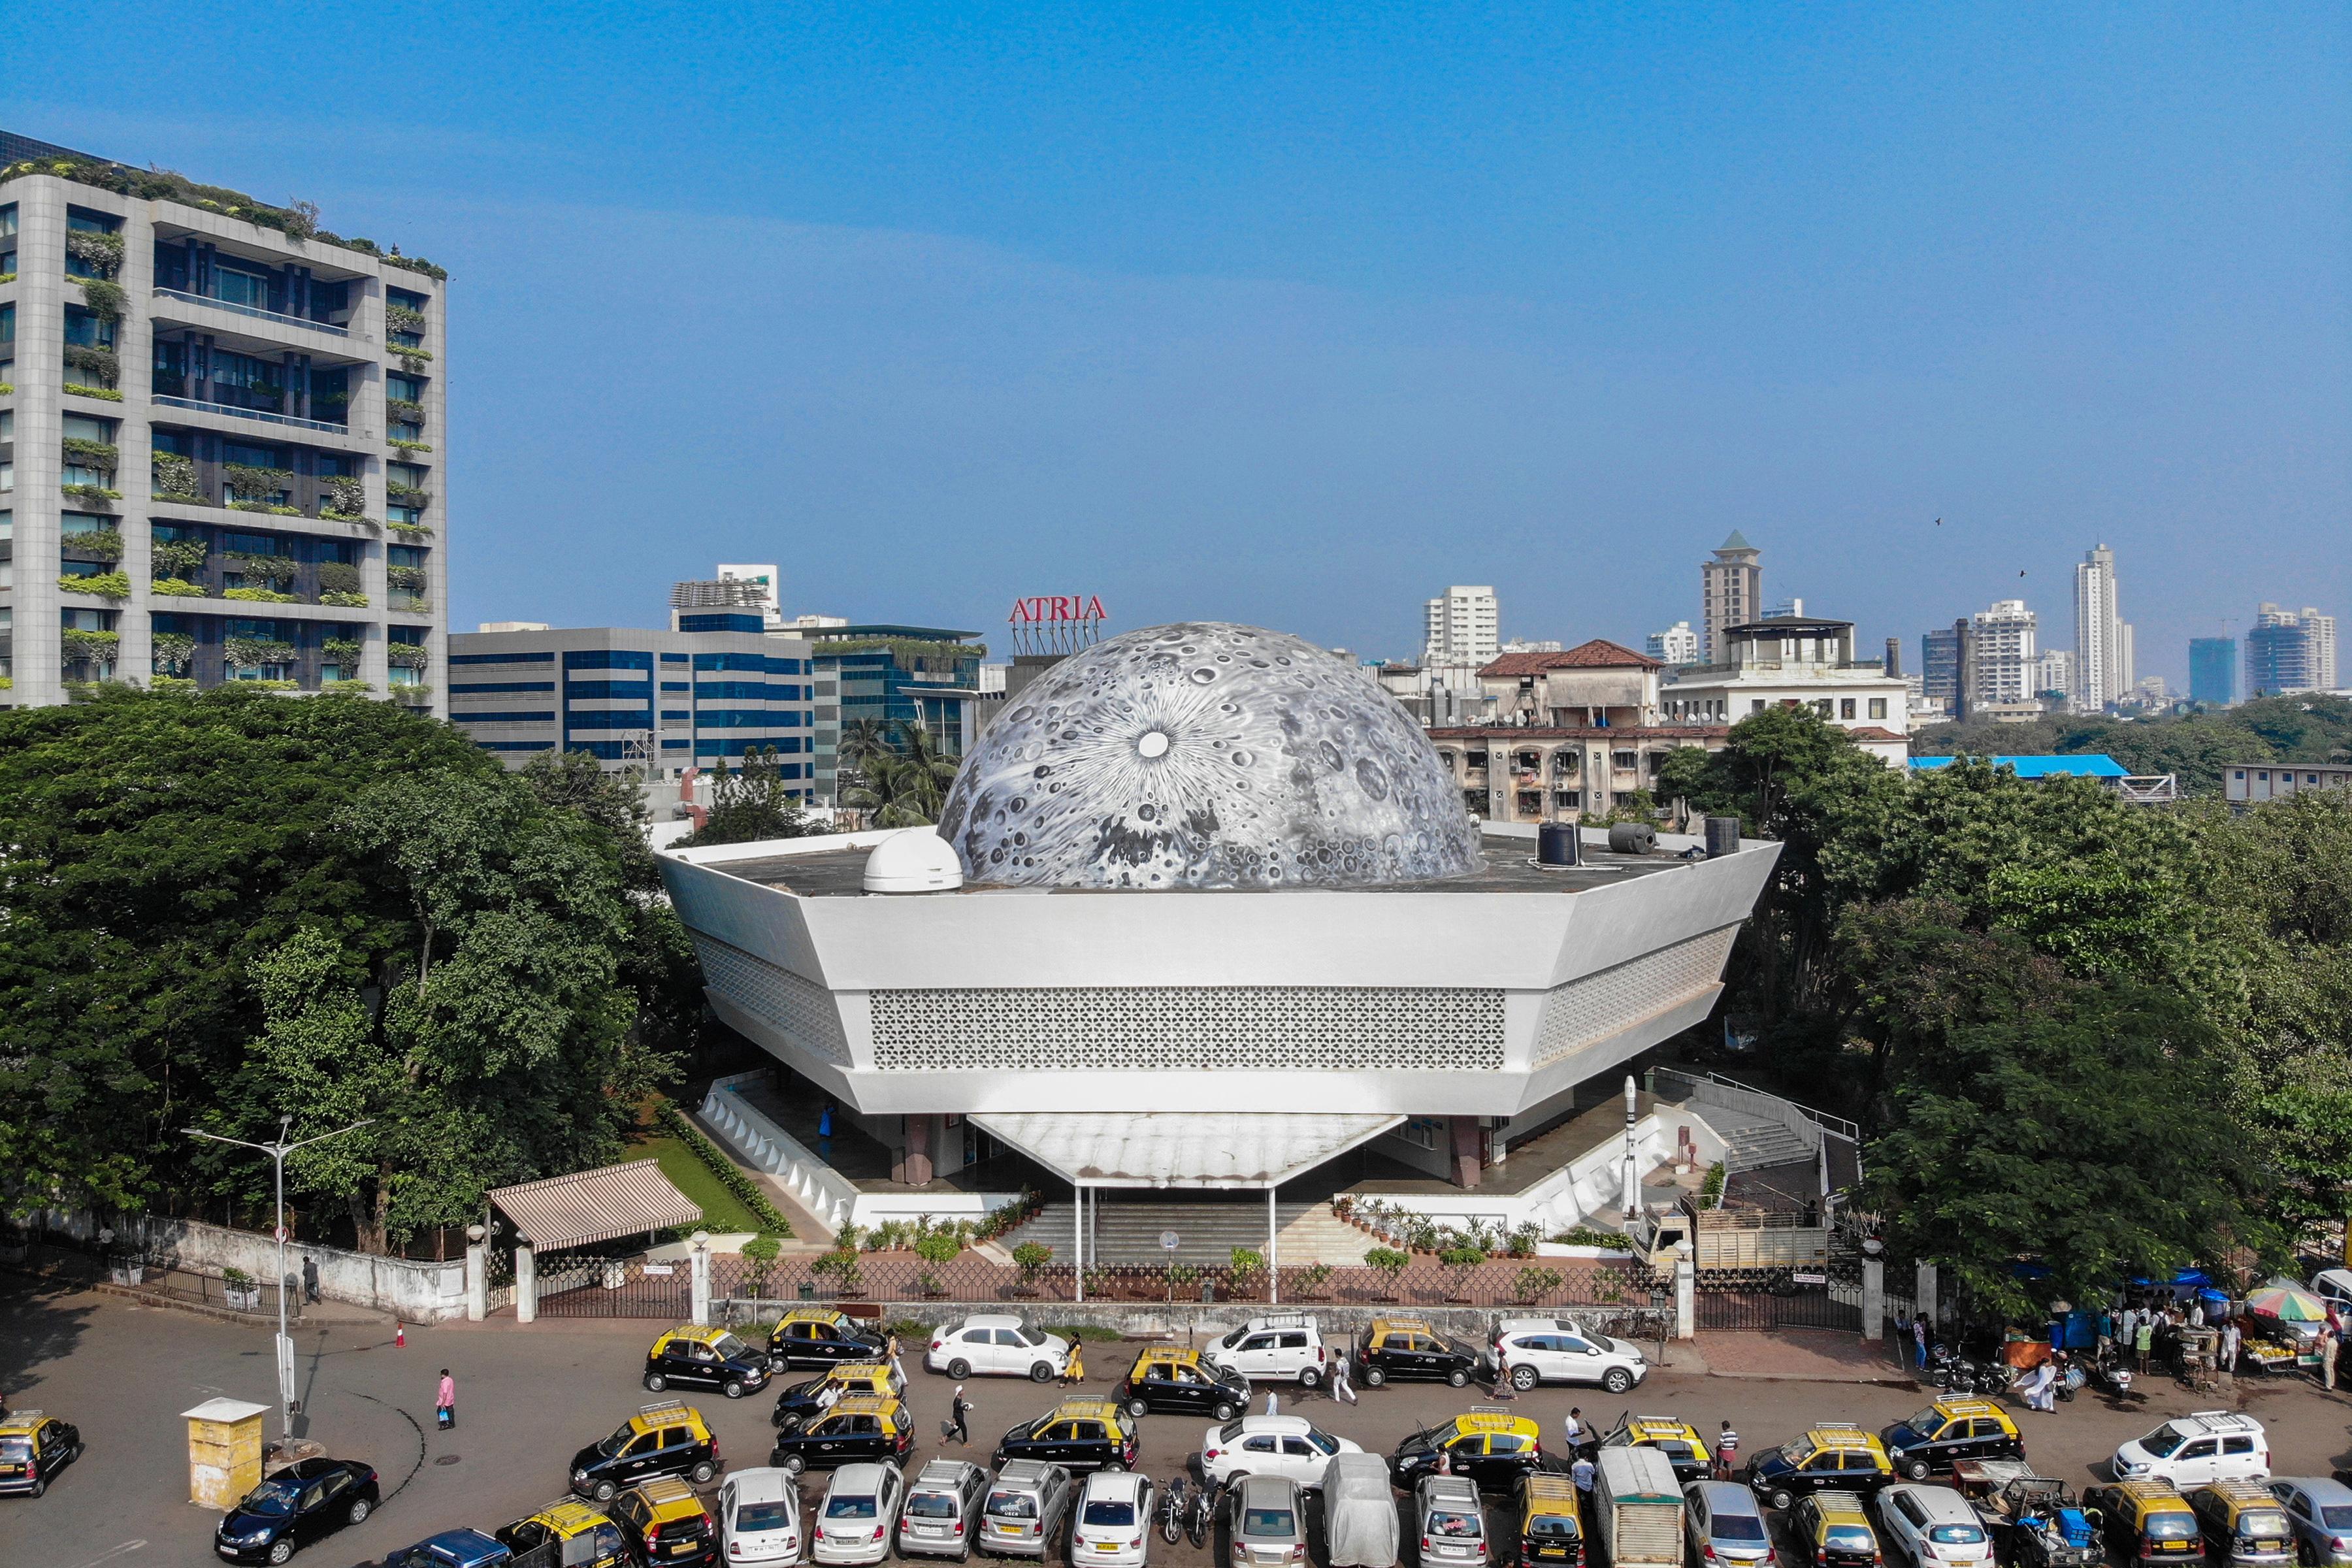 Lunar Dome at the Nehru Planetarium